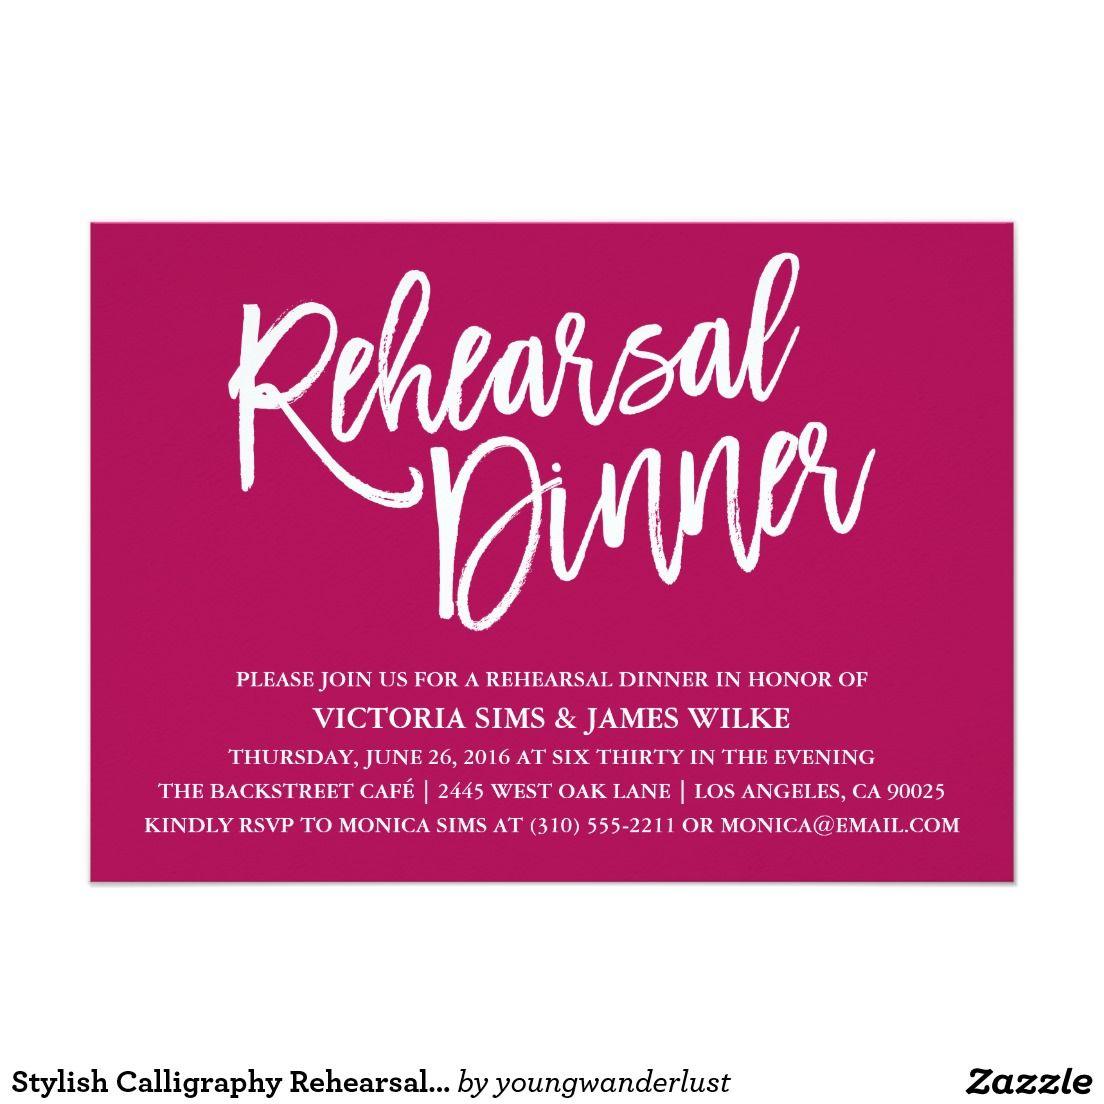 Modern Stylish Calligraphy Wine Rehearsal Dinner Invitation #wine ...